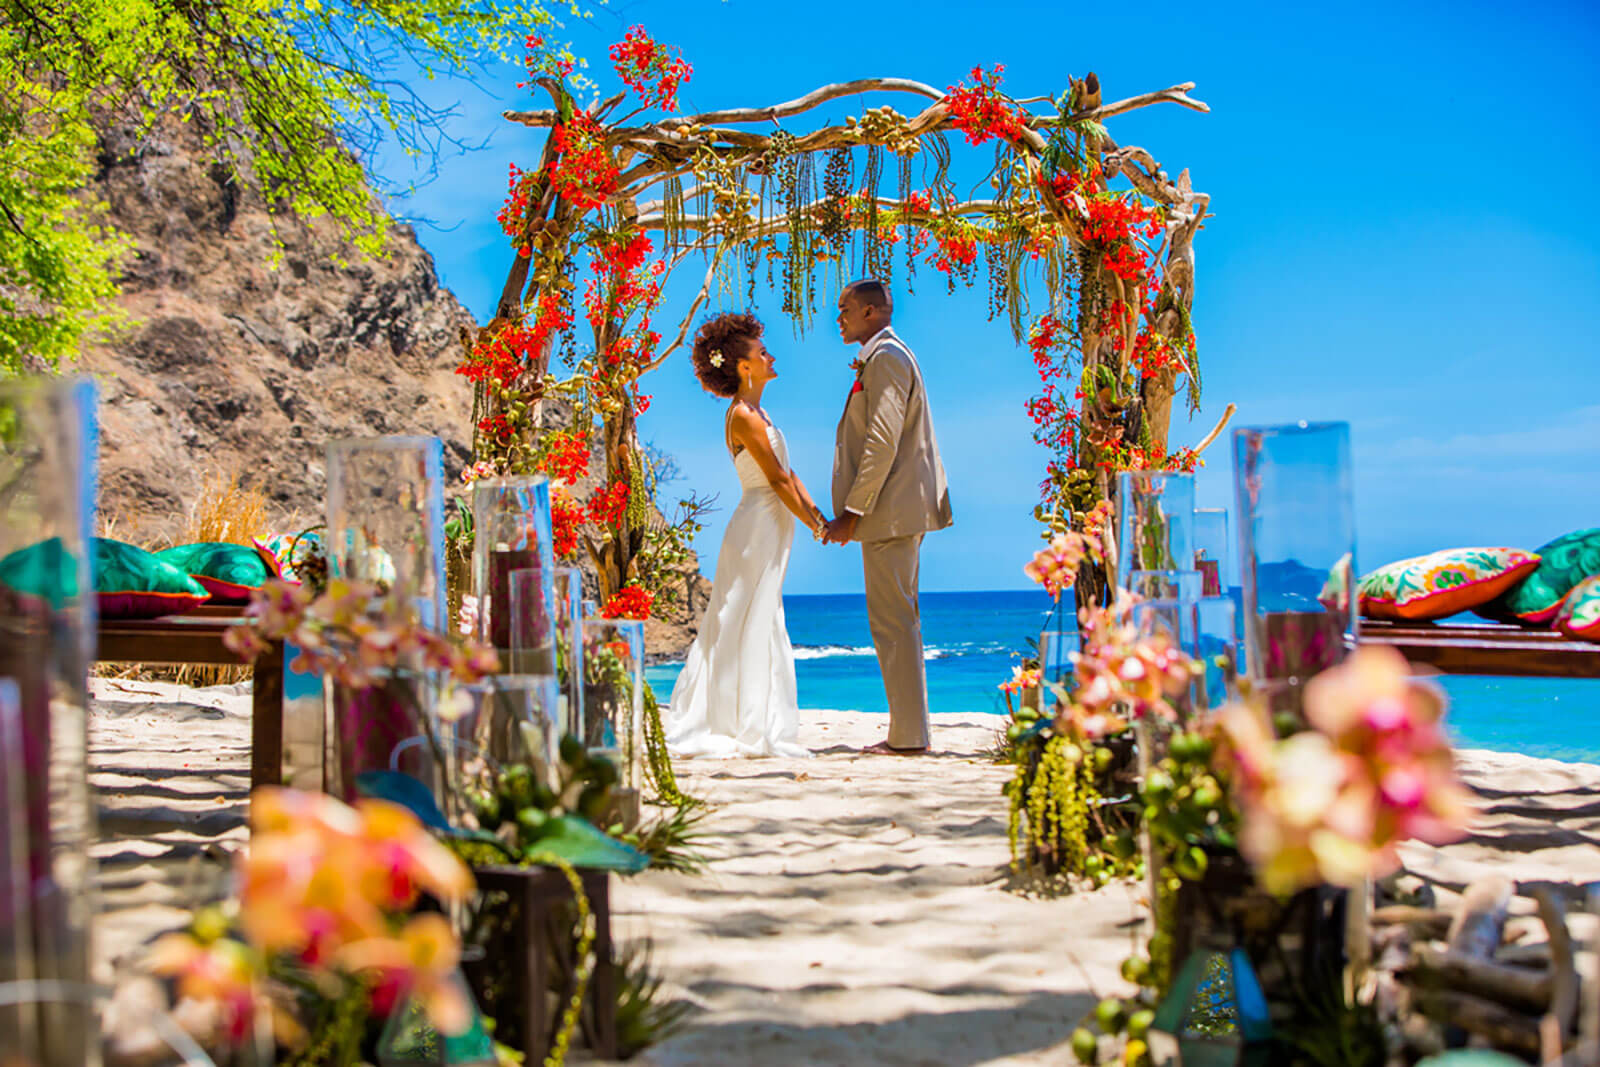 destiland-destitv-desti-bridefriends-guide-to-destination-weddings-podcast-black-destination-bride-blackdesti-tropical-occassions-aimee-monihan-costa-rica-wedding-planner-episode-15-1.jpg